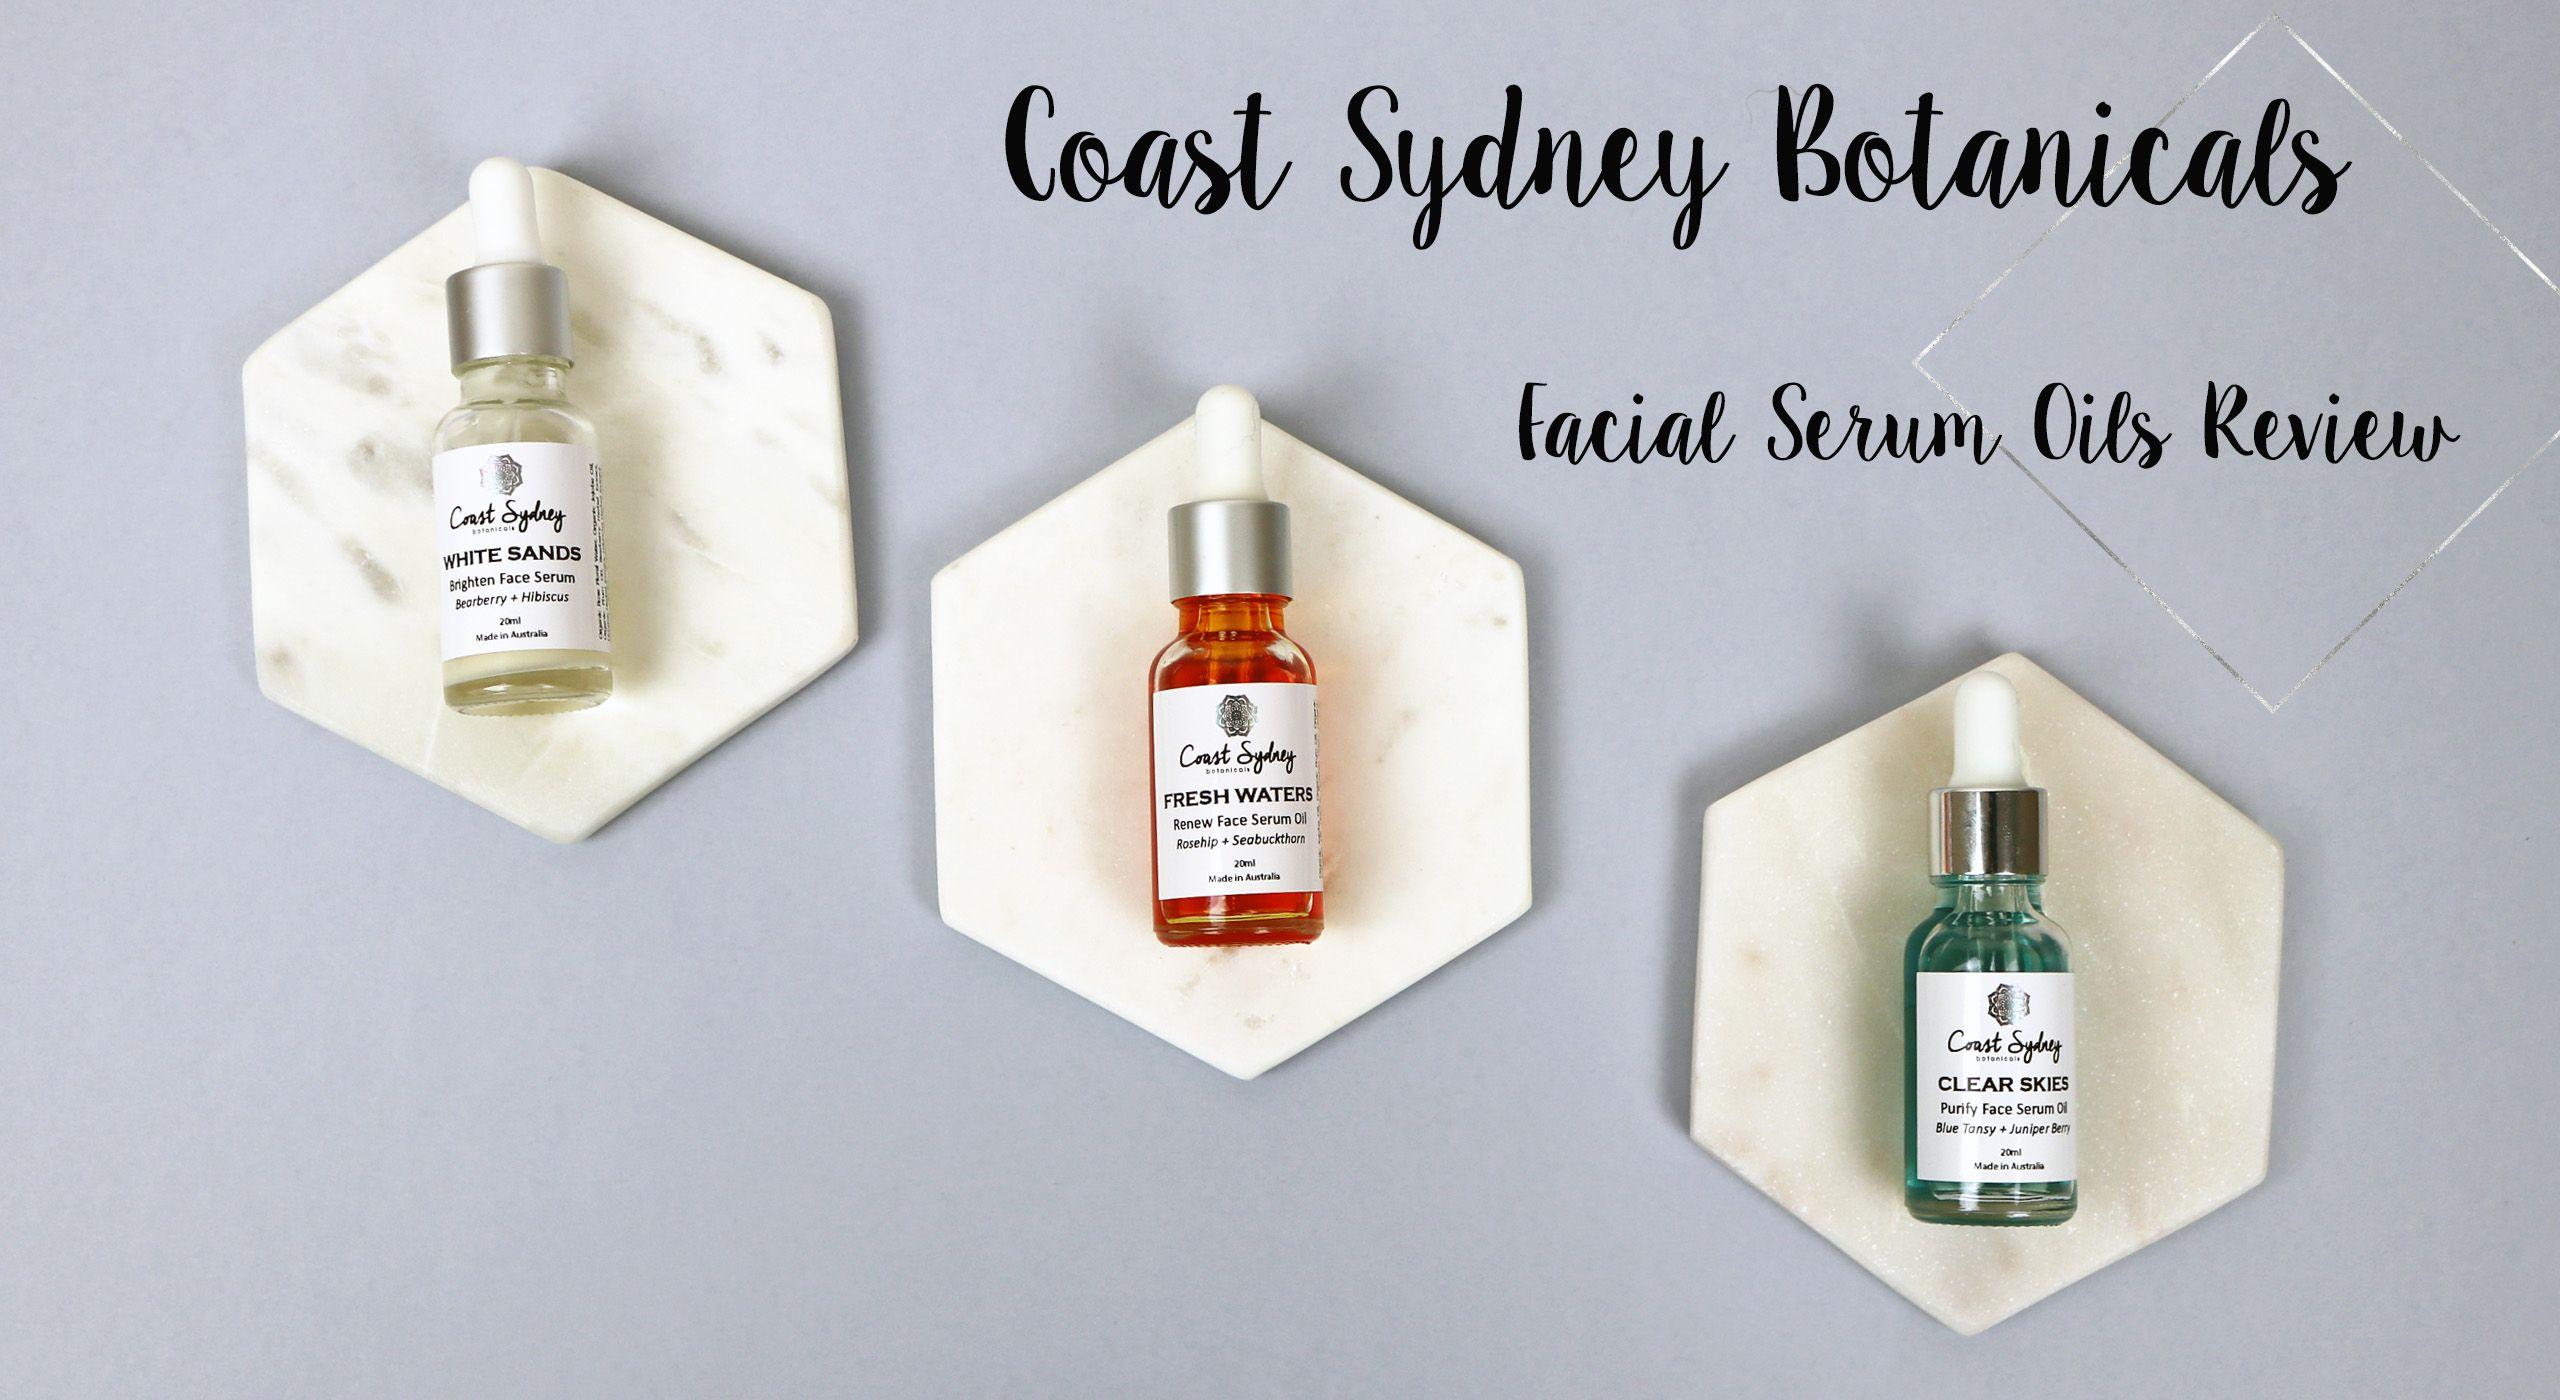 Coast Sydney Botanicals Facial Serum Oil Review Clear Skies Fresh Waters White Sands Facial Serum Serum Skincare Blog